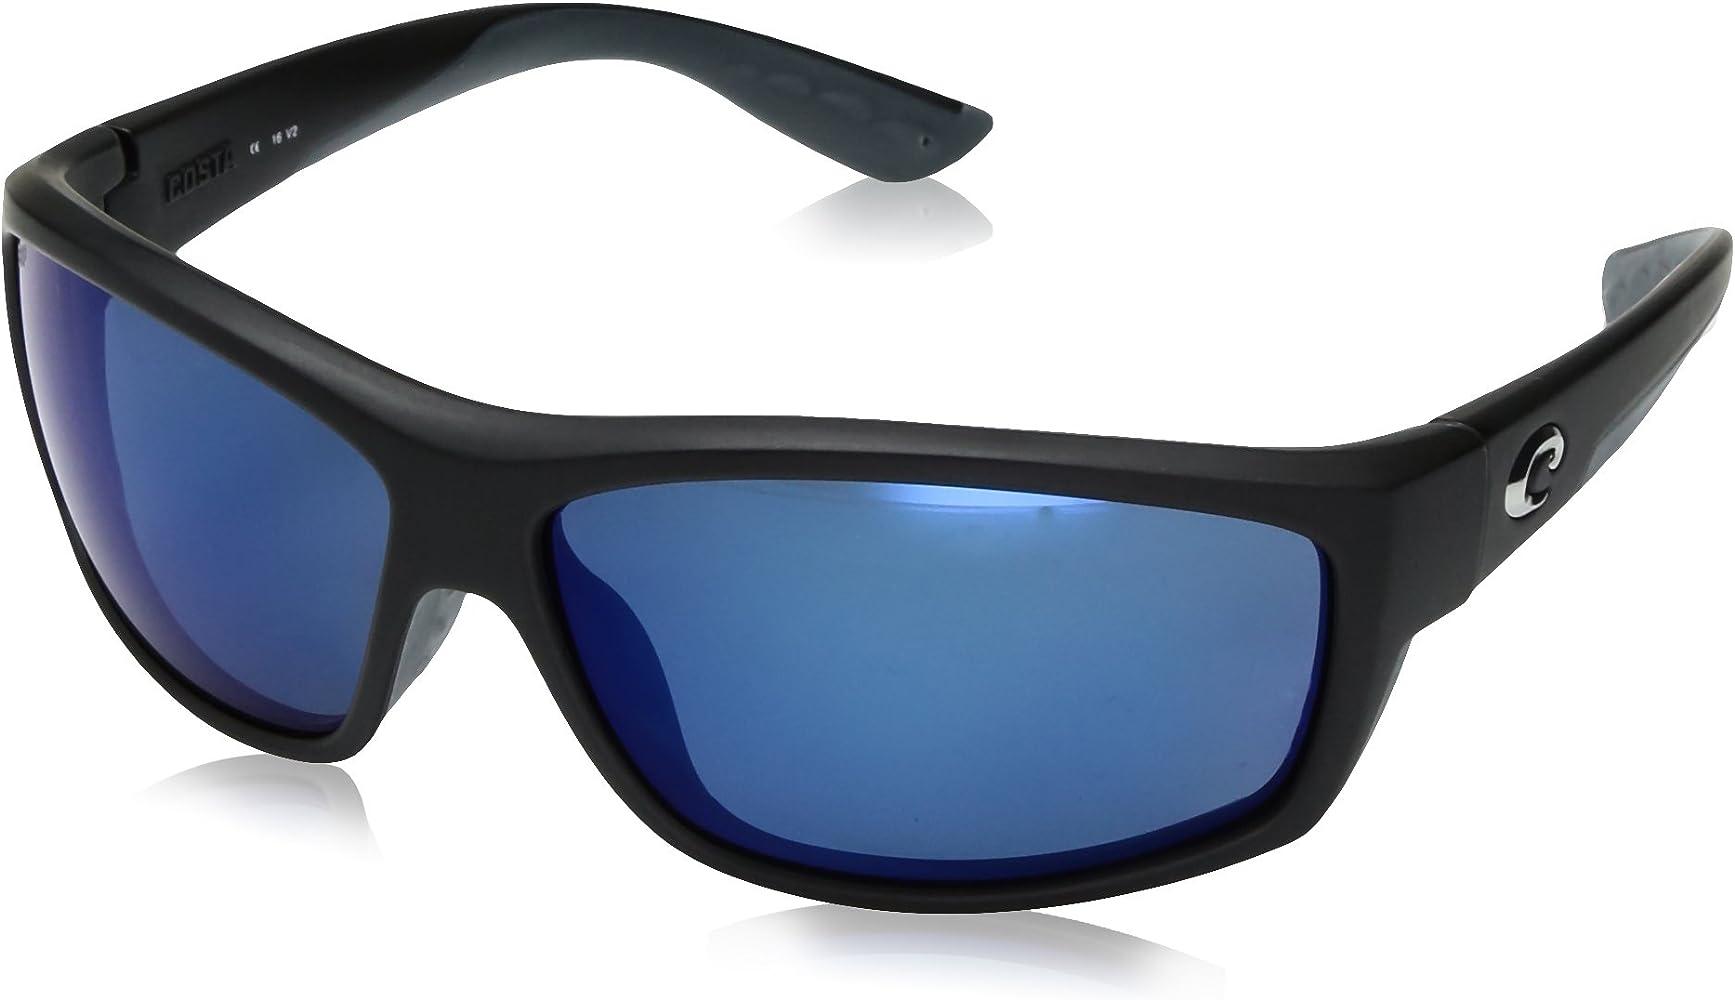 b8c2040095d3 Costa Del Mar Saltbreak 580P Saltbreak, Black Blue Mirror, Blue Mirror